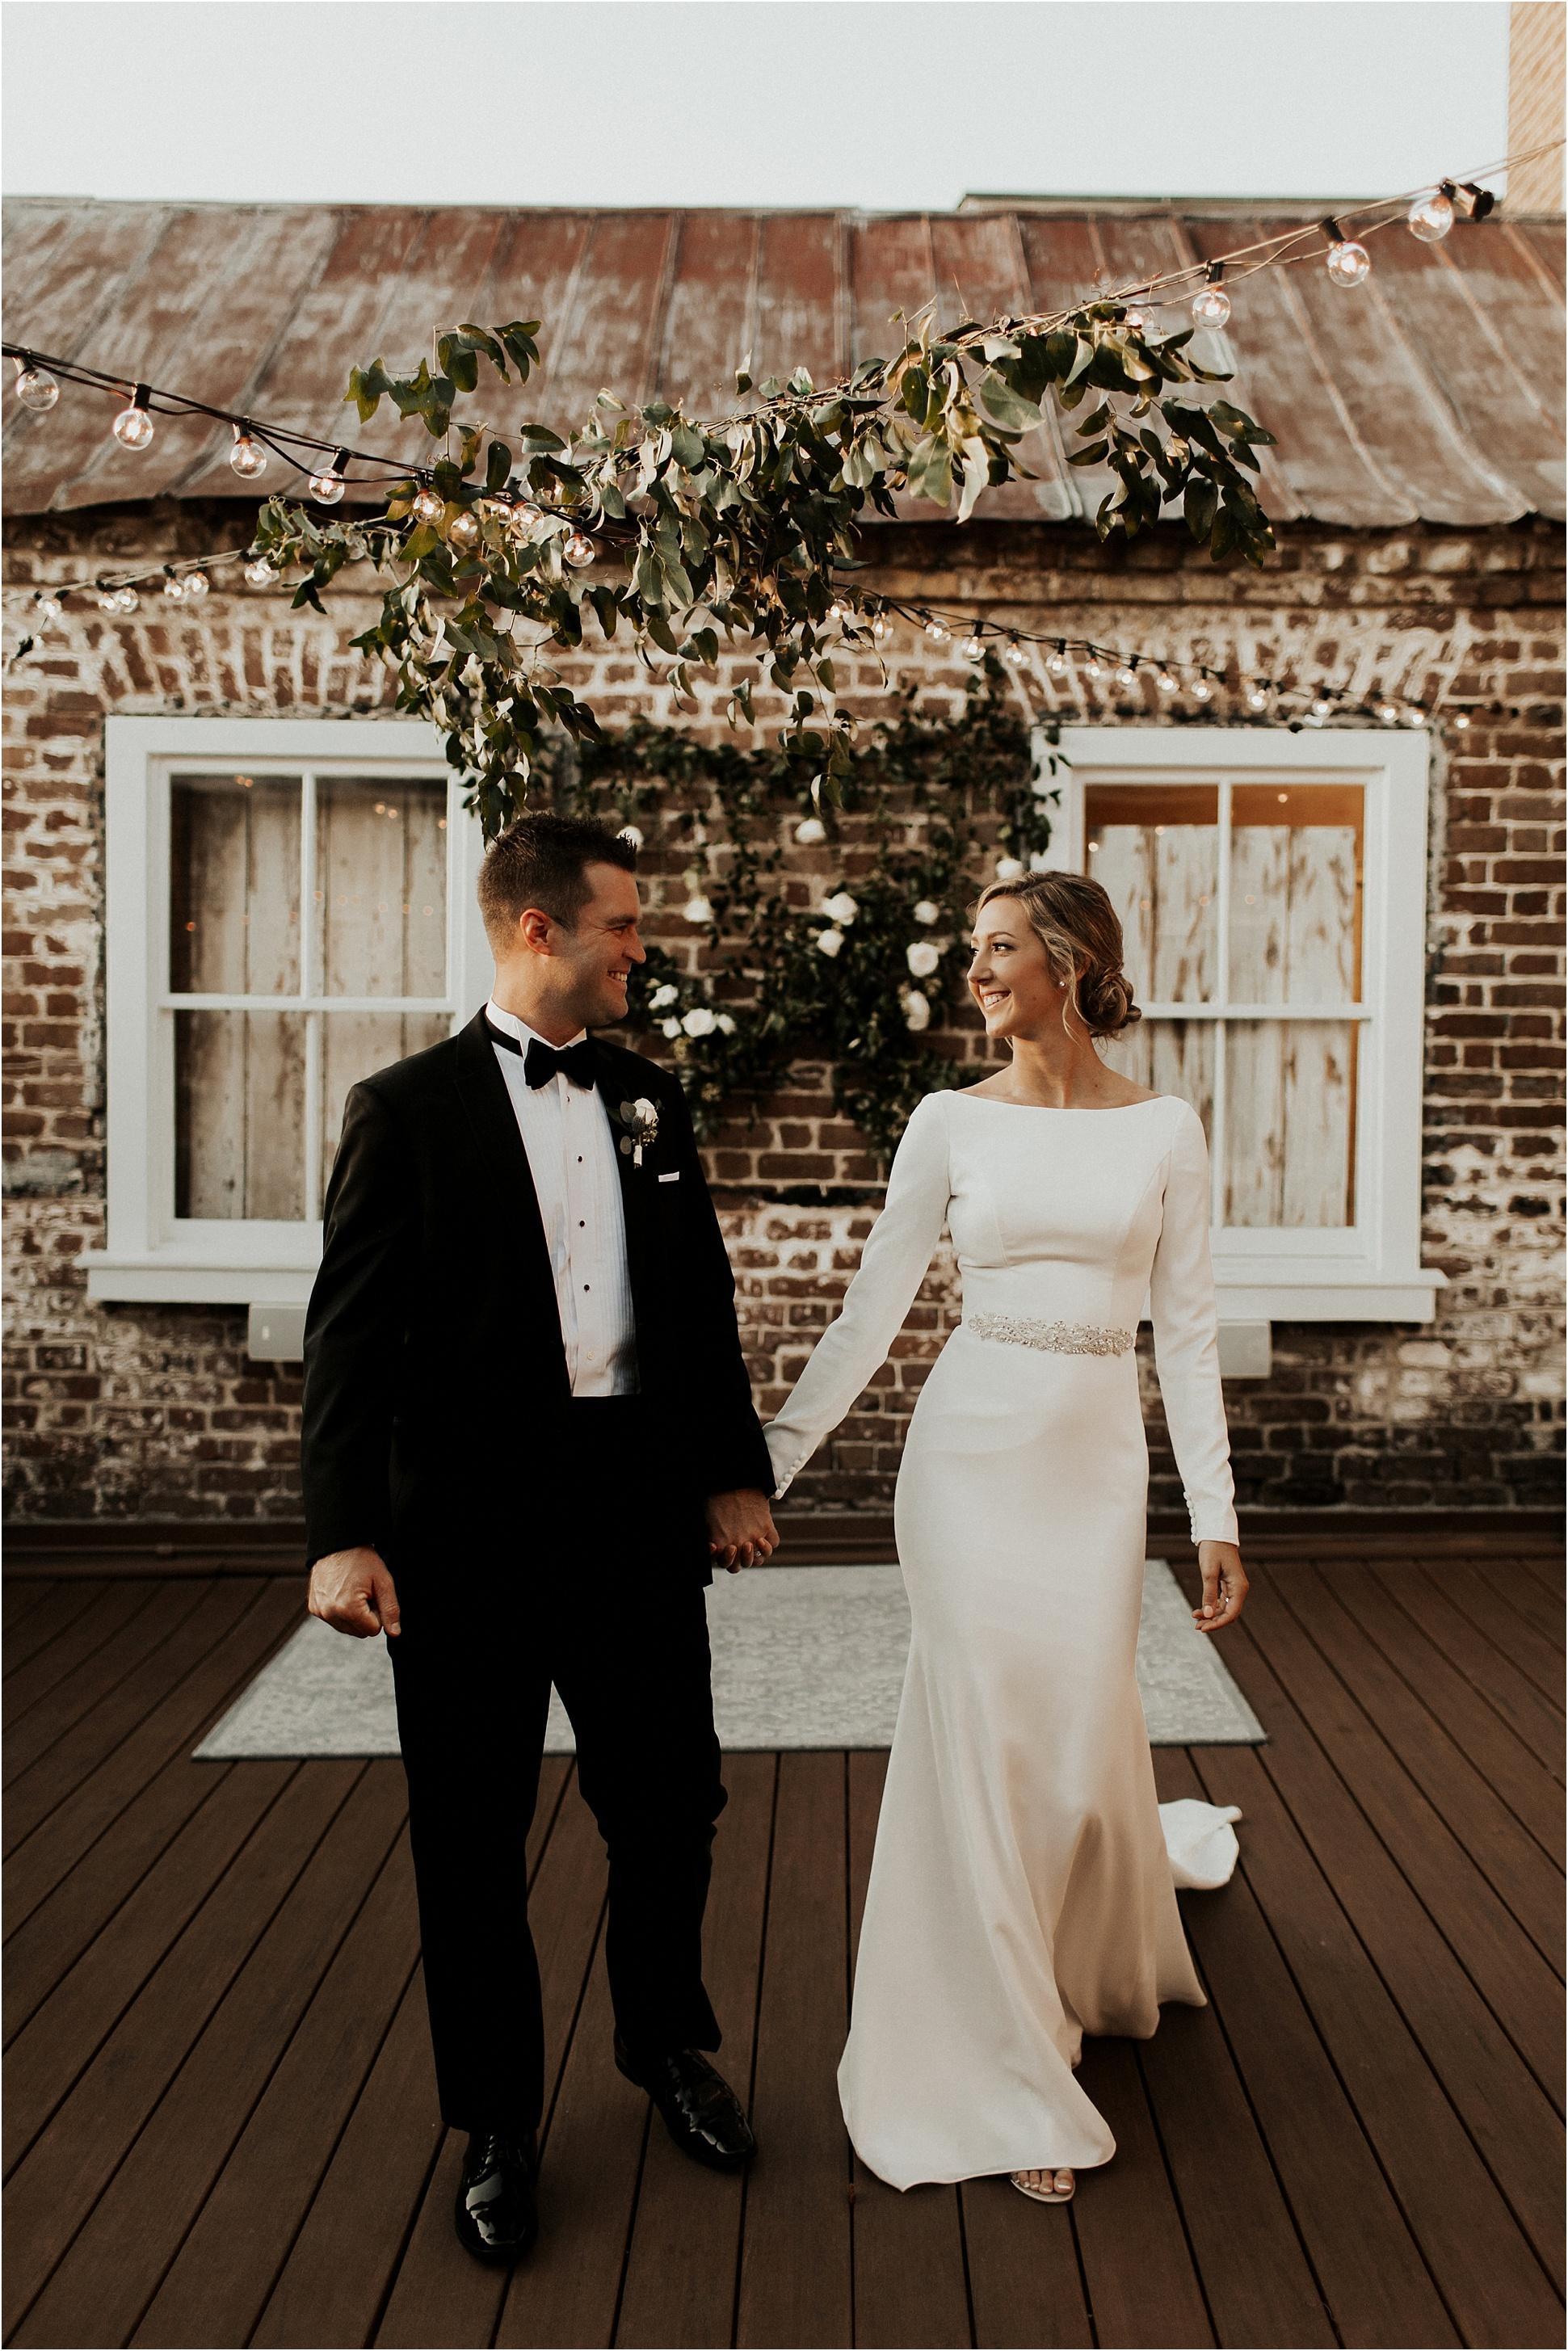 upstairs_midtown_intimate_charleston_wedding070.JPG